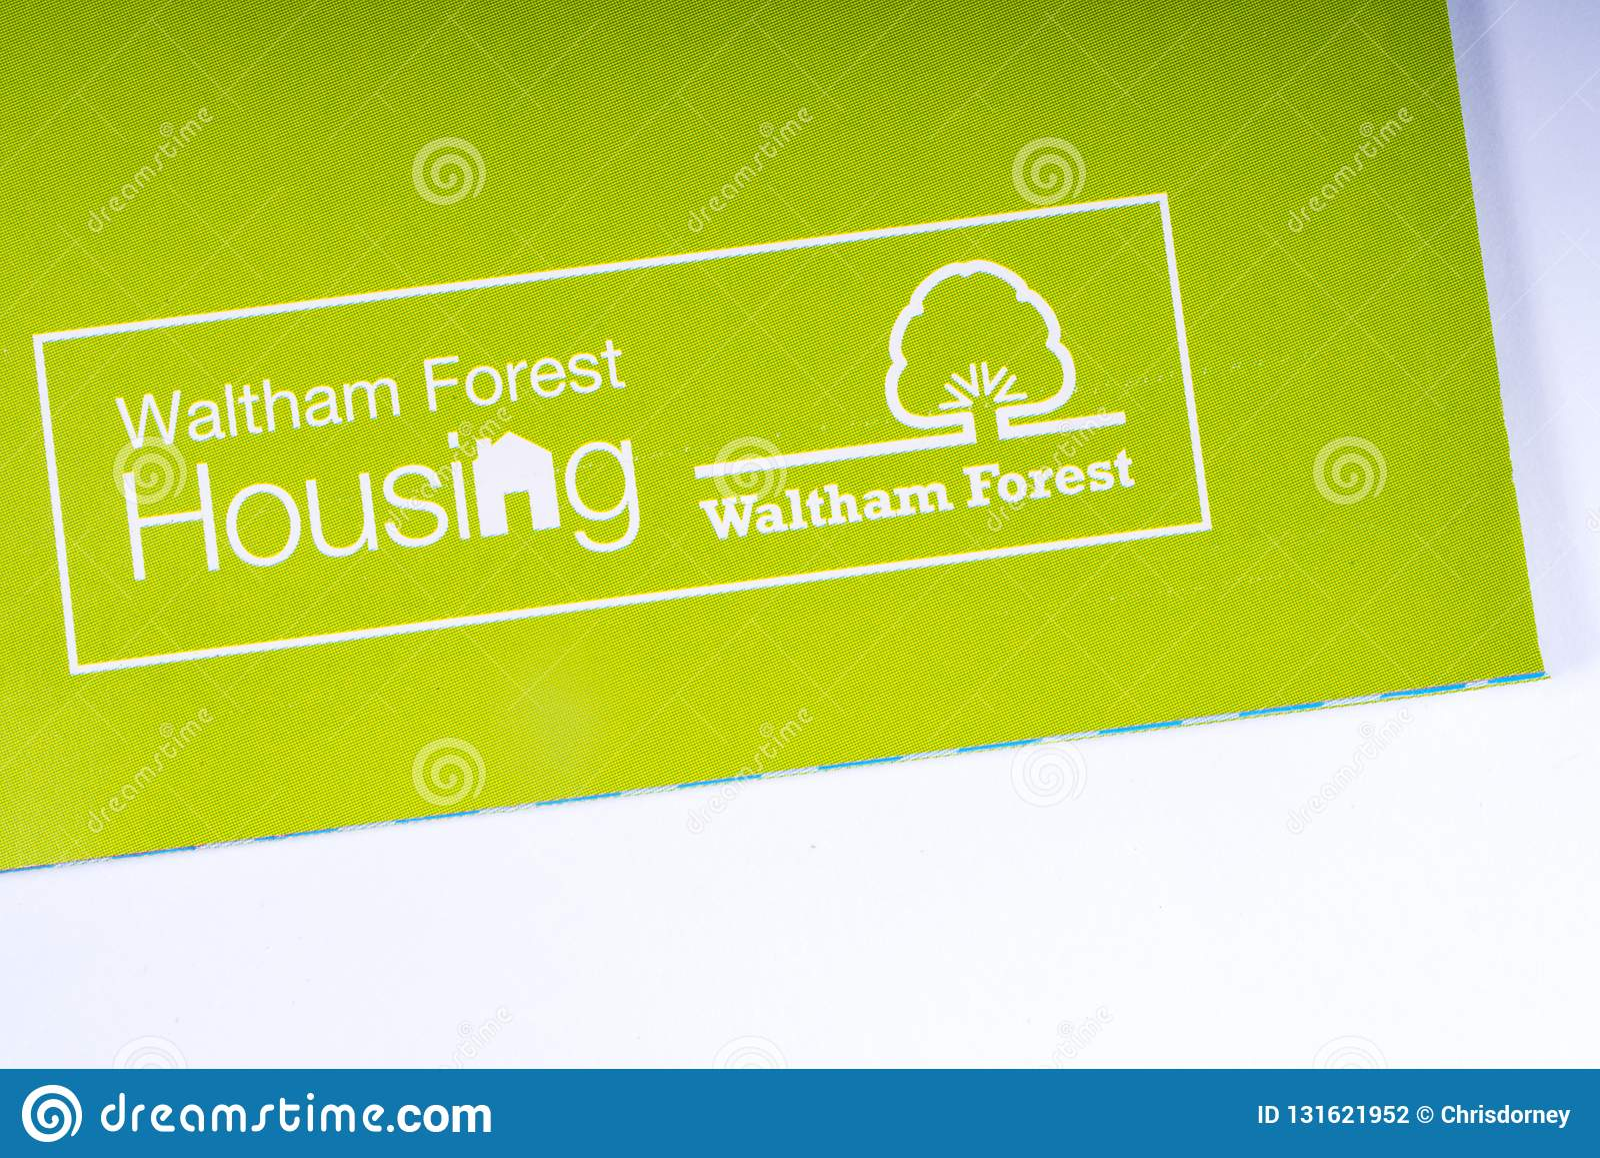 Das Logo Waltham Forest Housing